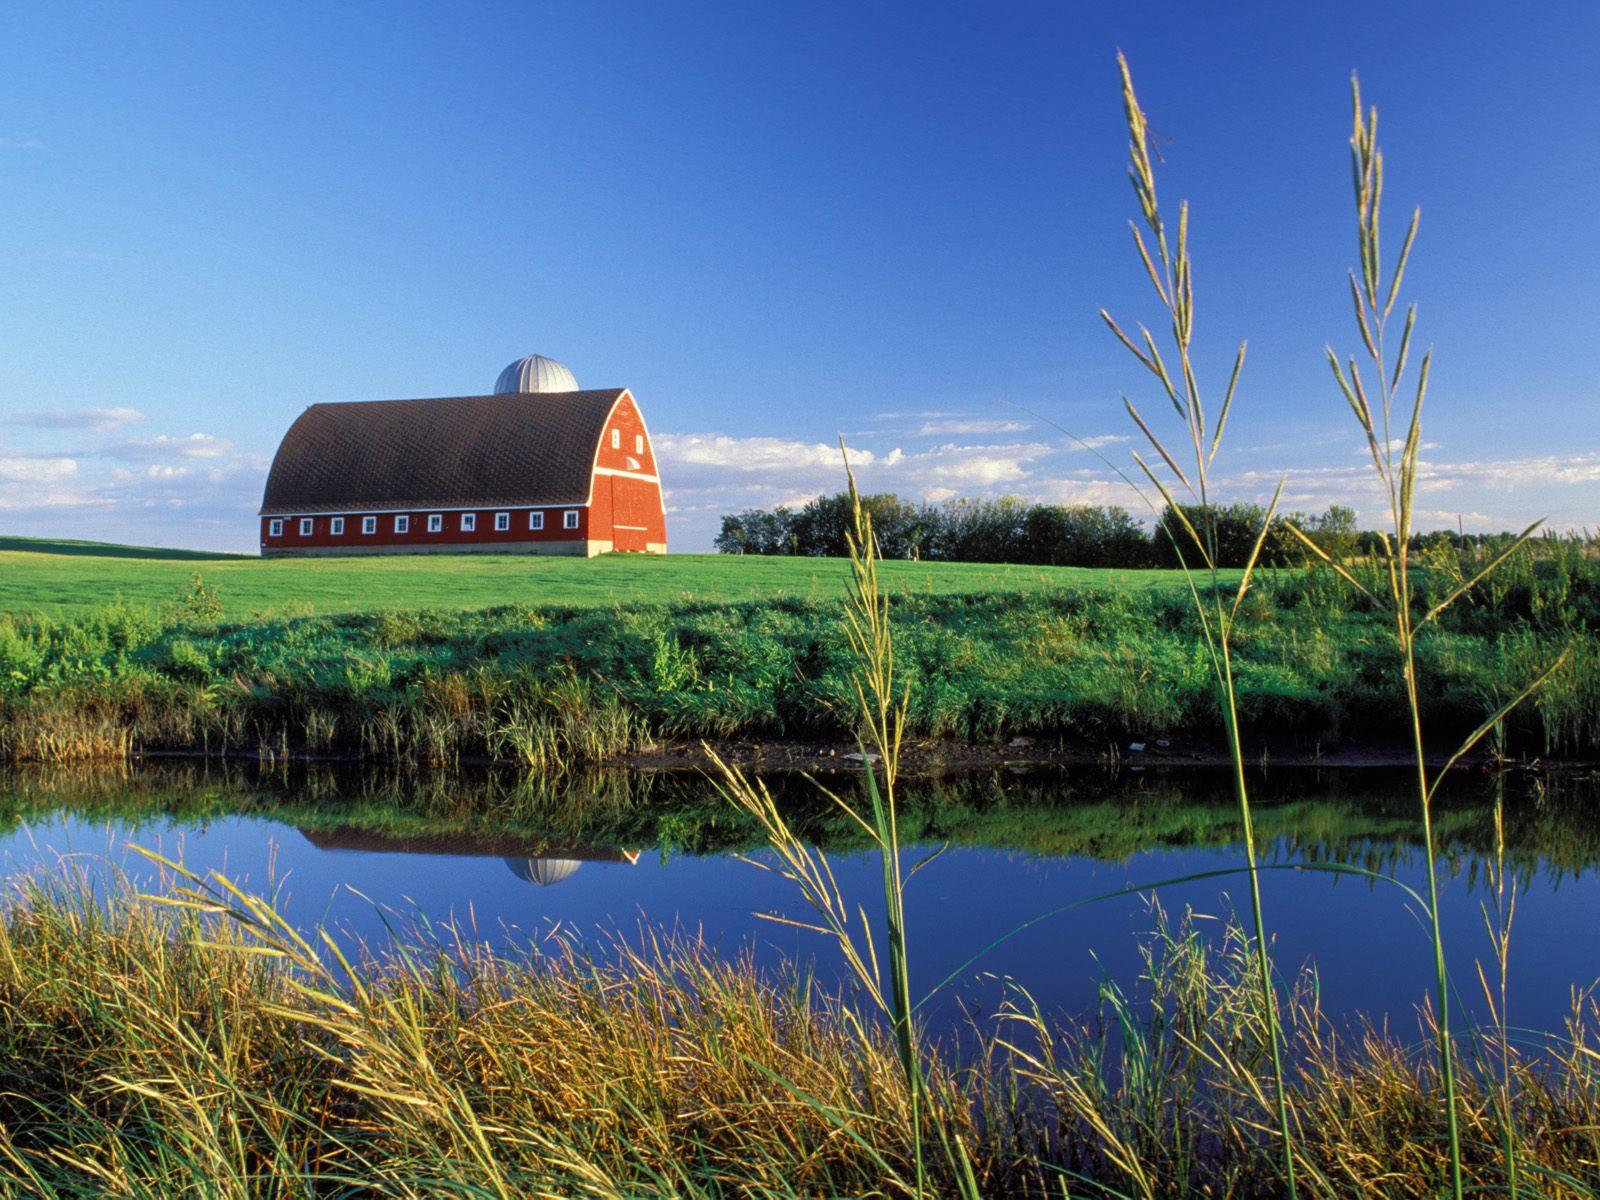 summer_country__north_dakota_wallpaper_by_sosyalinsan-d523195